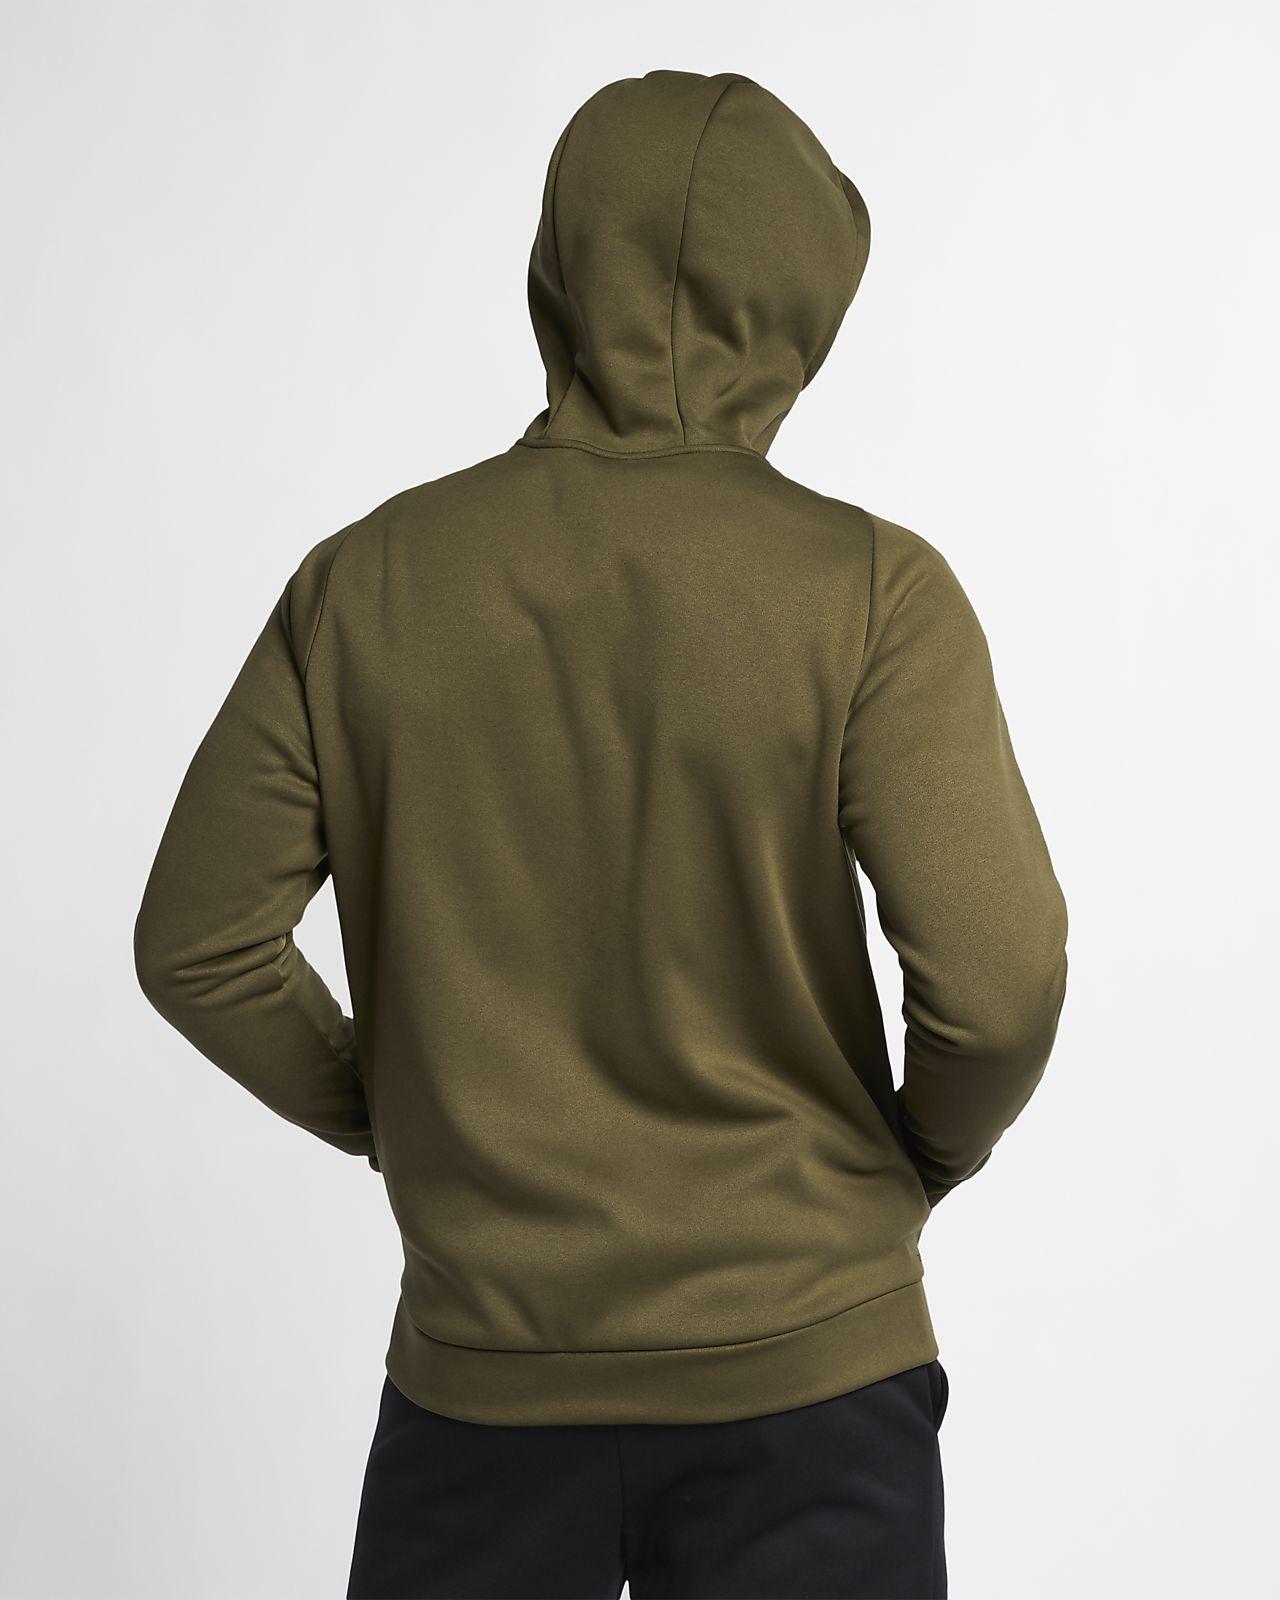 9e91d1a53db4 Nike Dri-FIT Therma Men s Full-Zip Training Hoodie. Nike.com GB